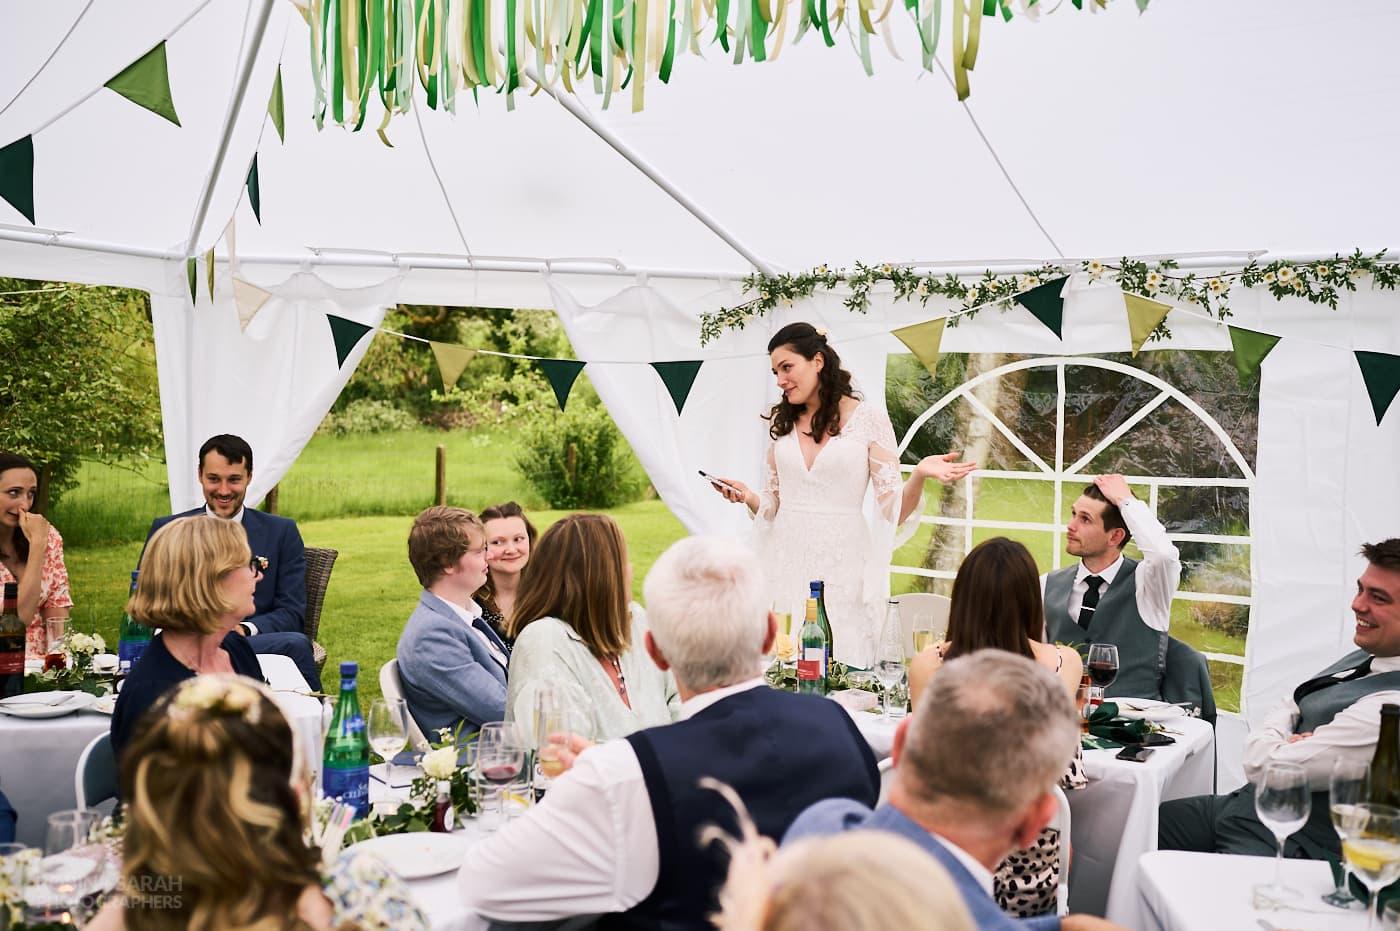 Bride gives speech in marquee at small garden wedding